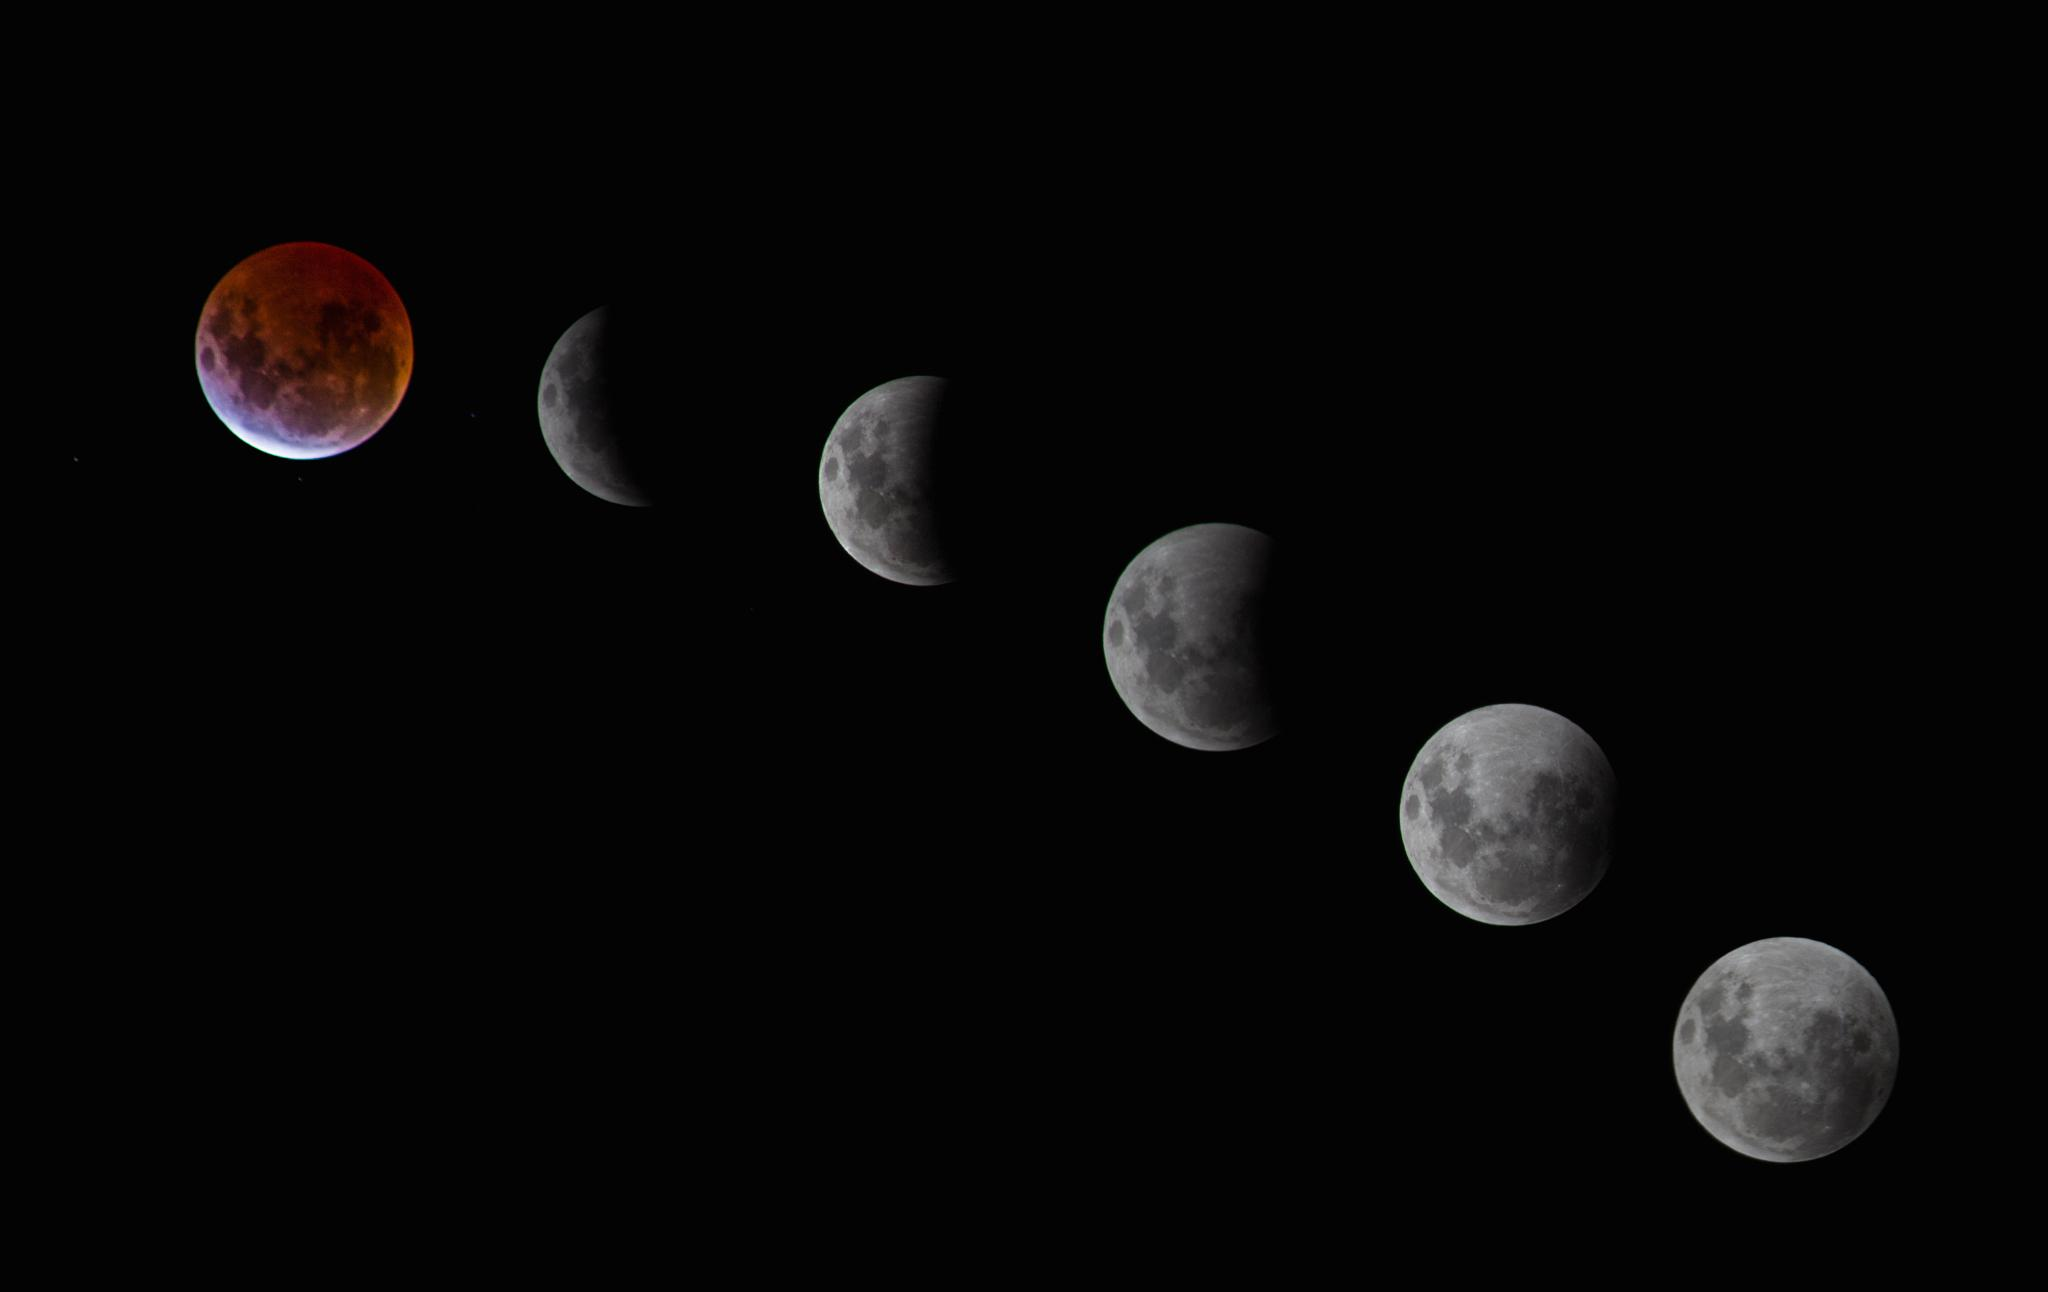 Blood moon by Lisa.I